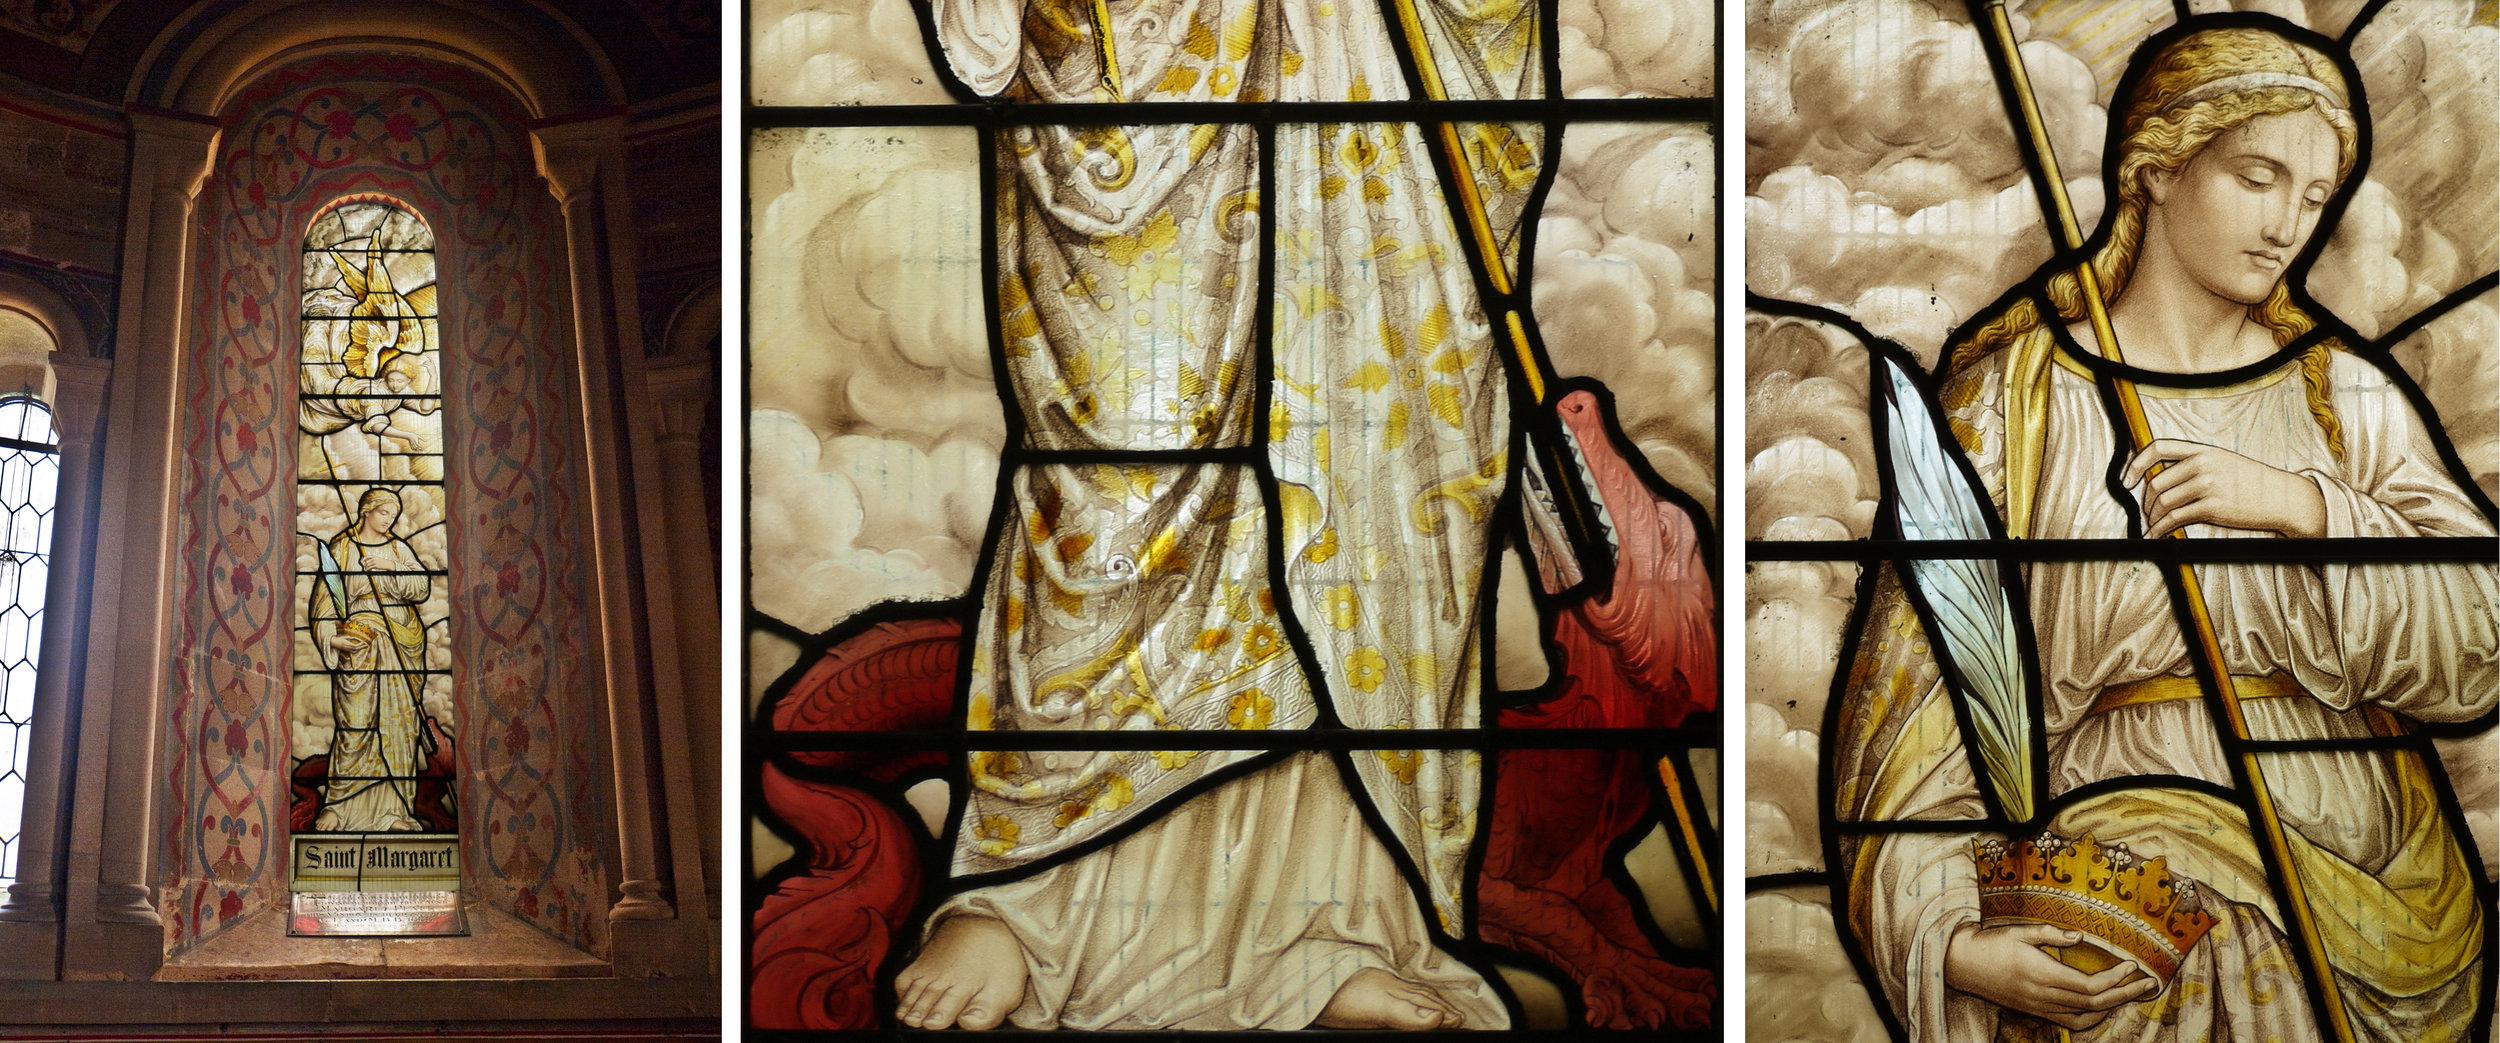 Left hand window, St Margaret & details, HB&B 1888